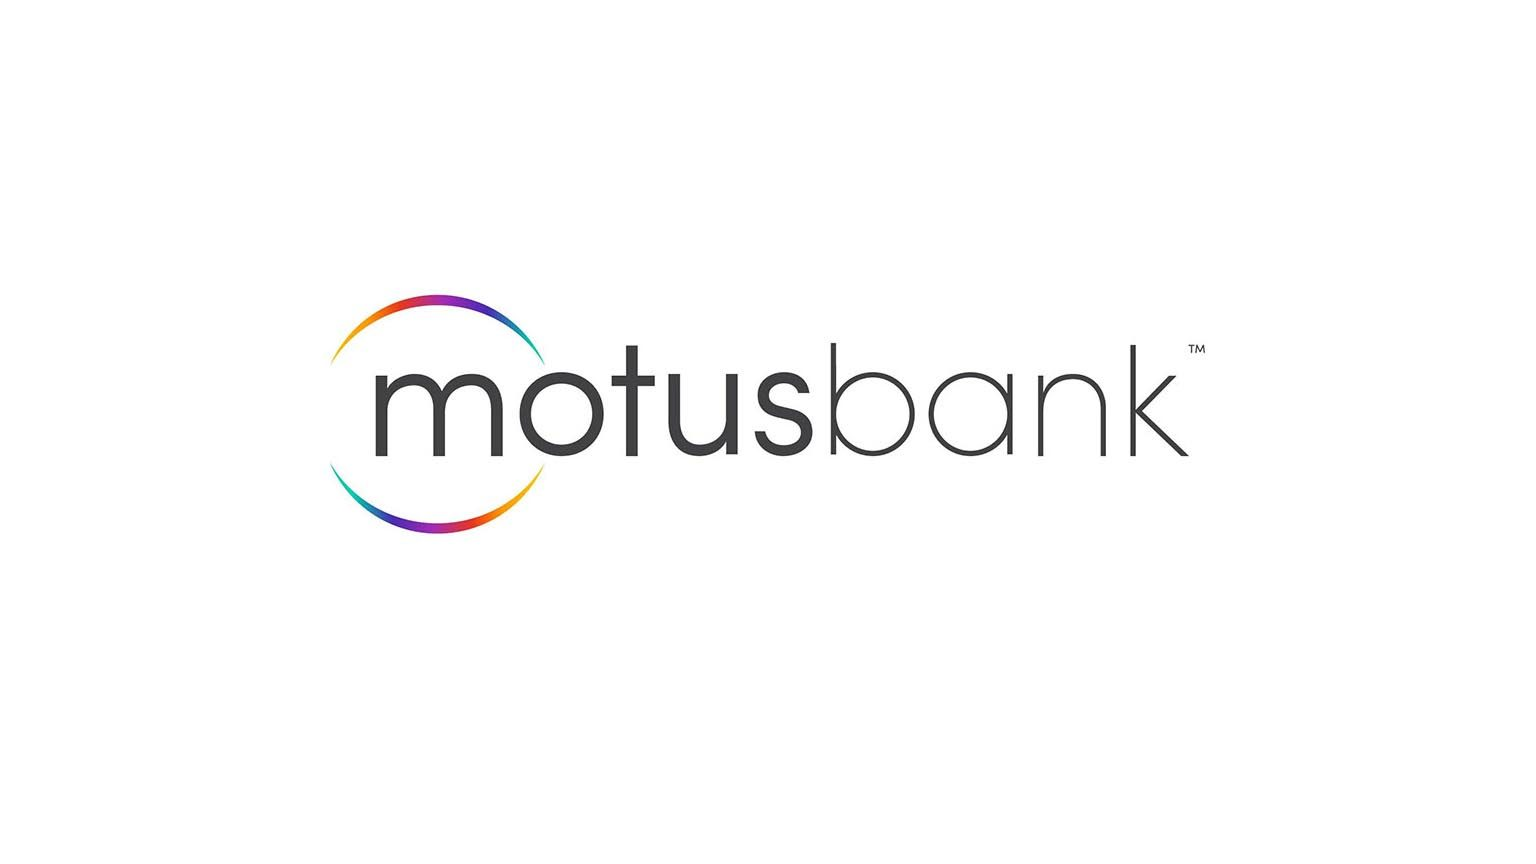 motusbank logo for motusbank GIC